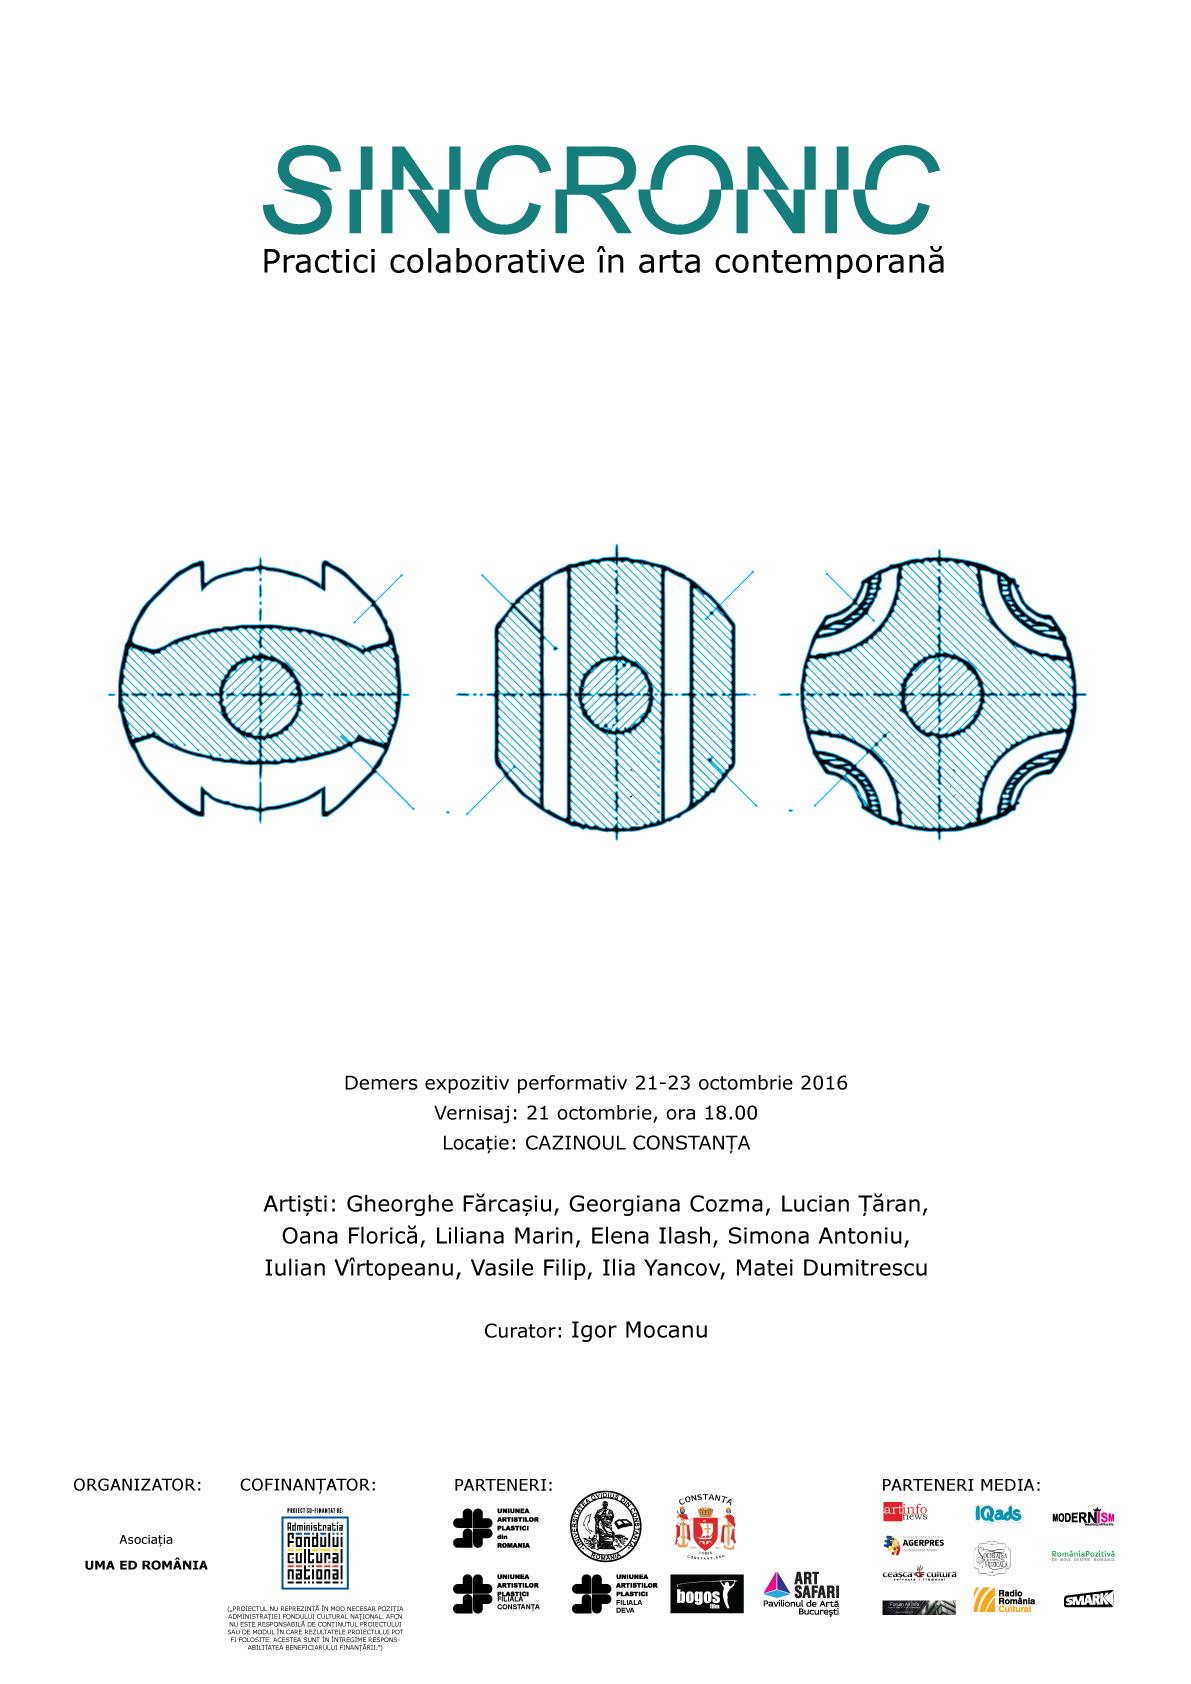 sincronic_A2-constanta_web ultim